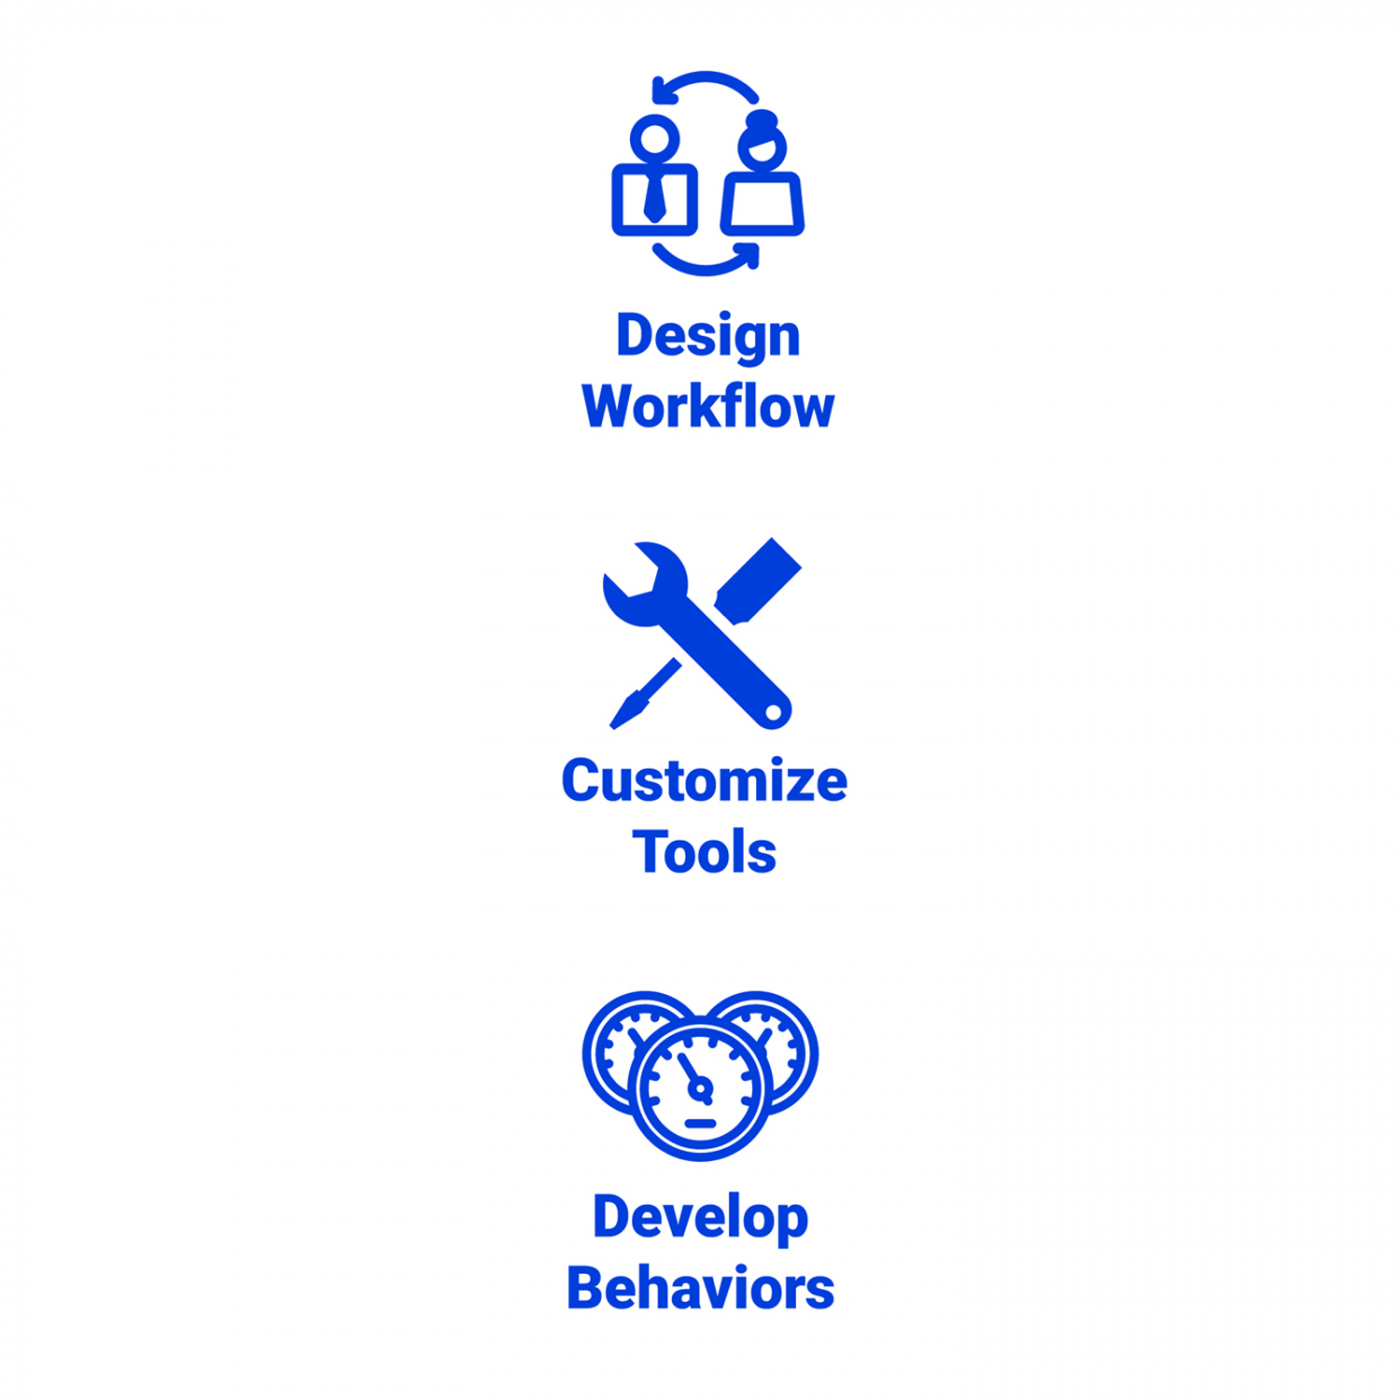 Workflow_DiSTI_ISIT